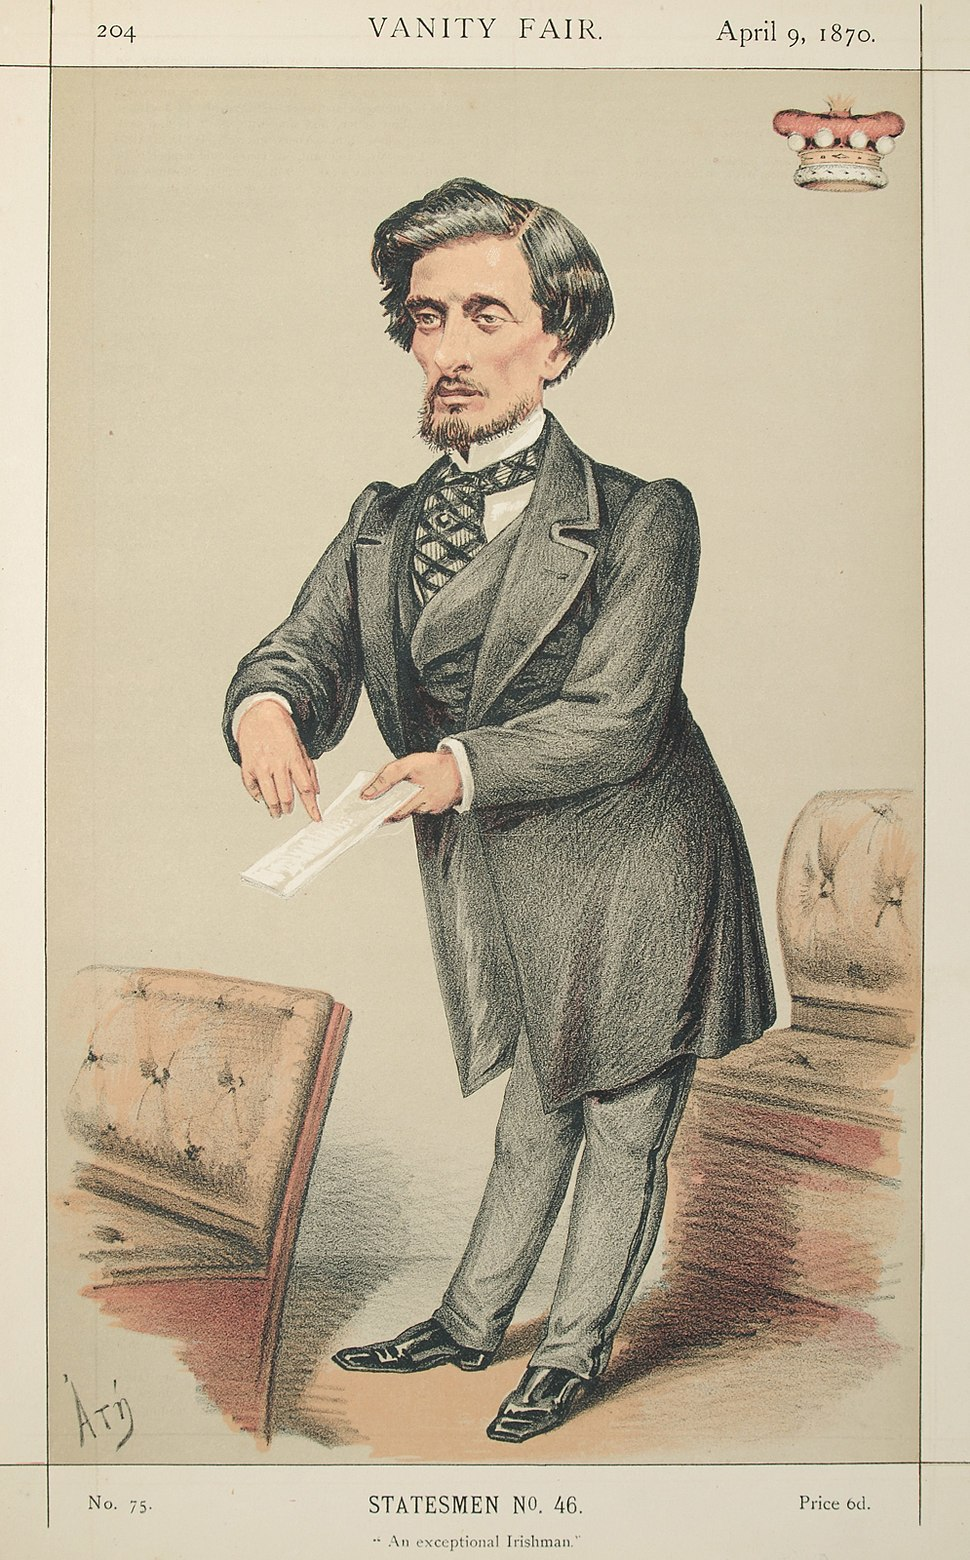 Frederick Hamilton-Temple-Blackwood, Vanity Fair, 1870-04-09